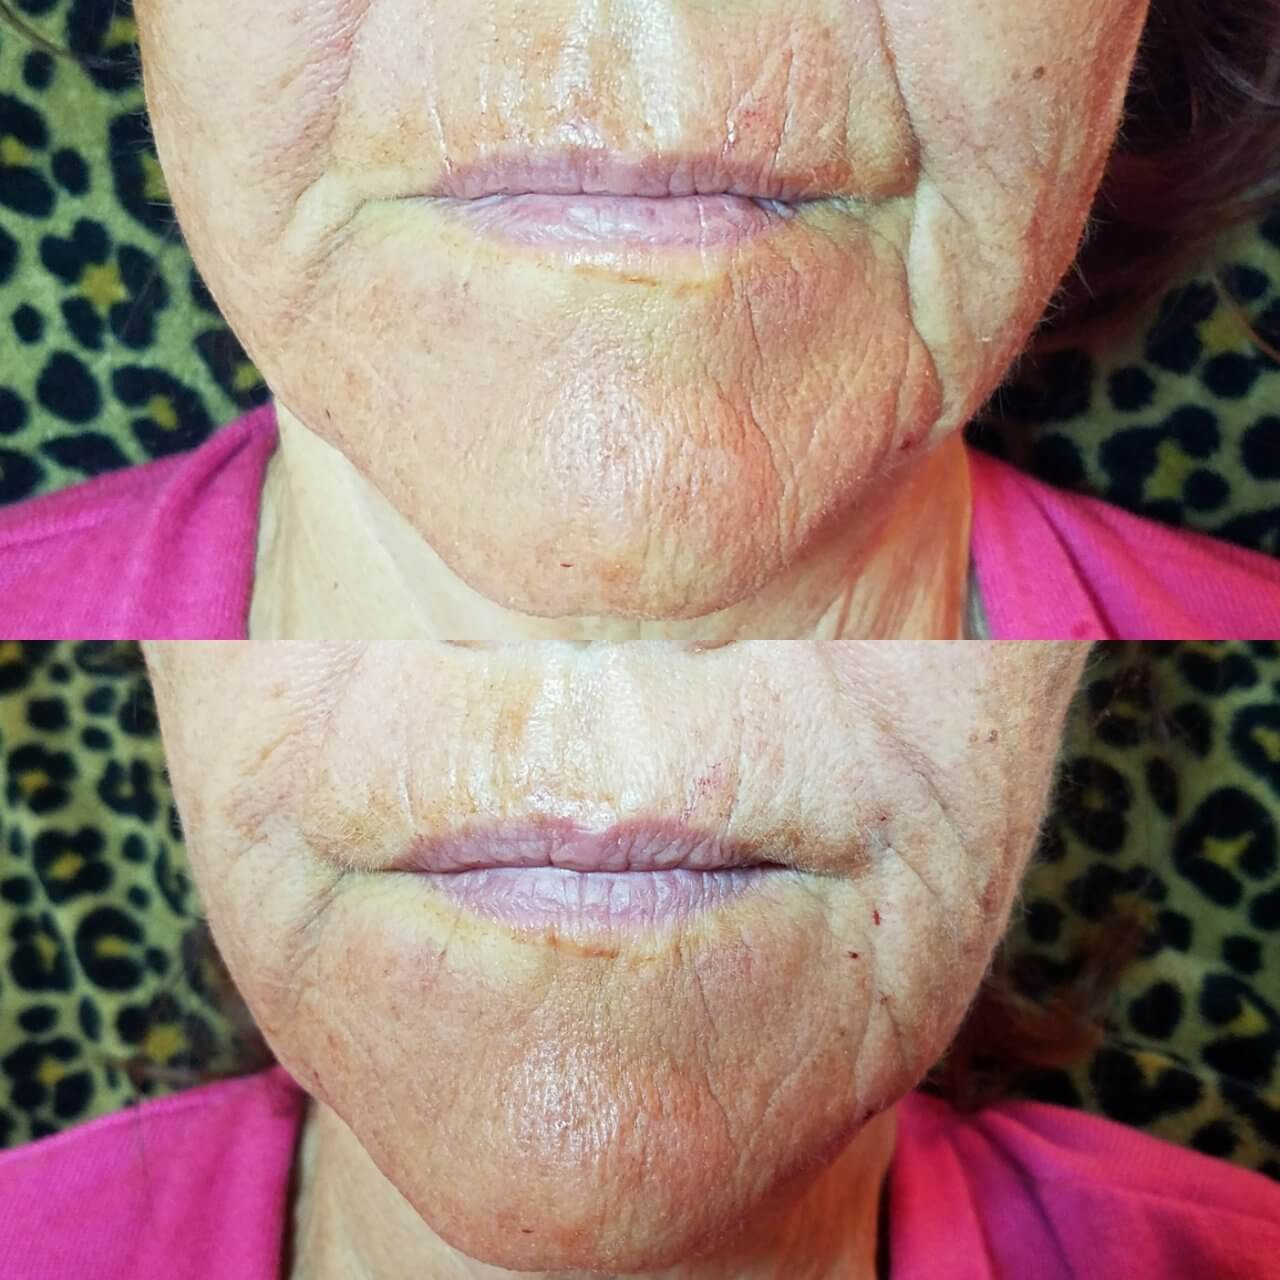 lip-enhancement-5-lip-fillers-sarasota-fl